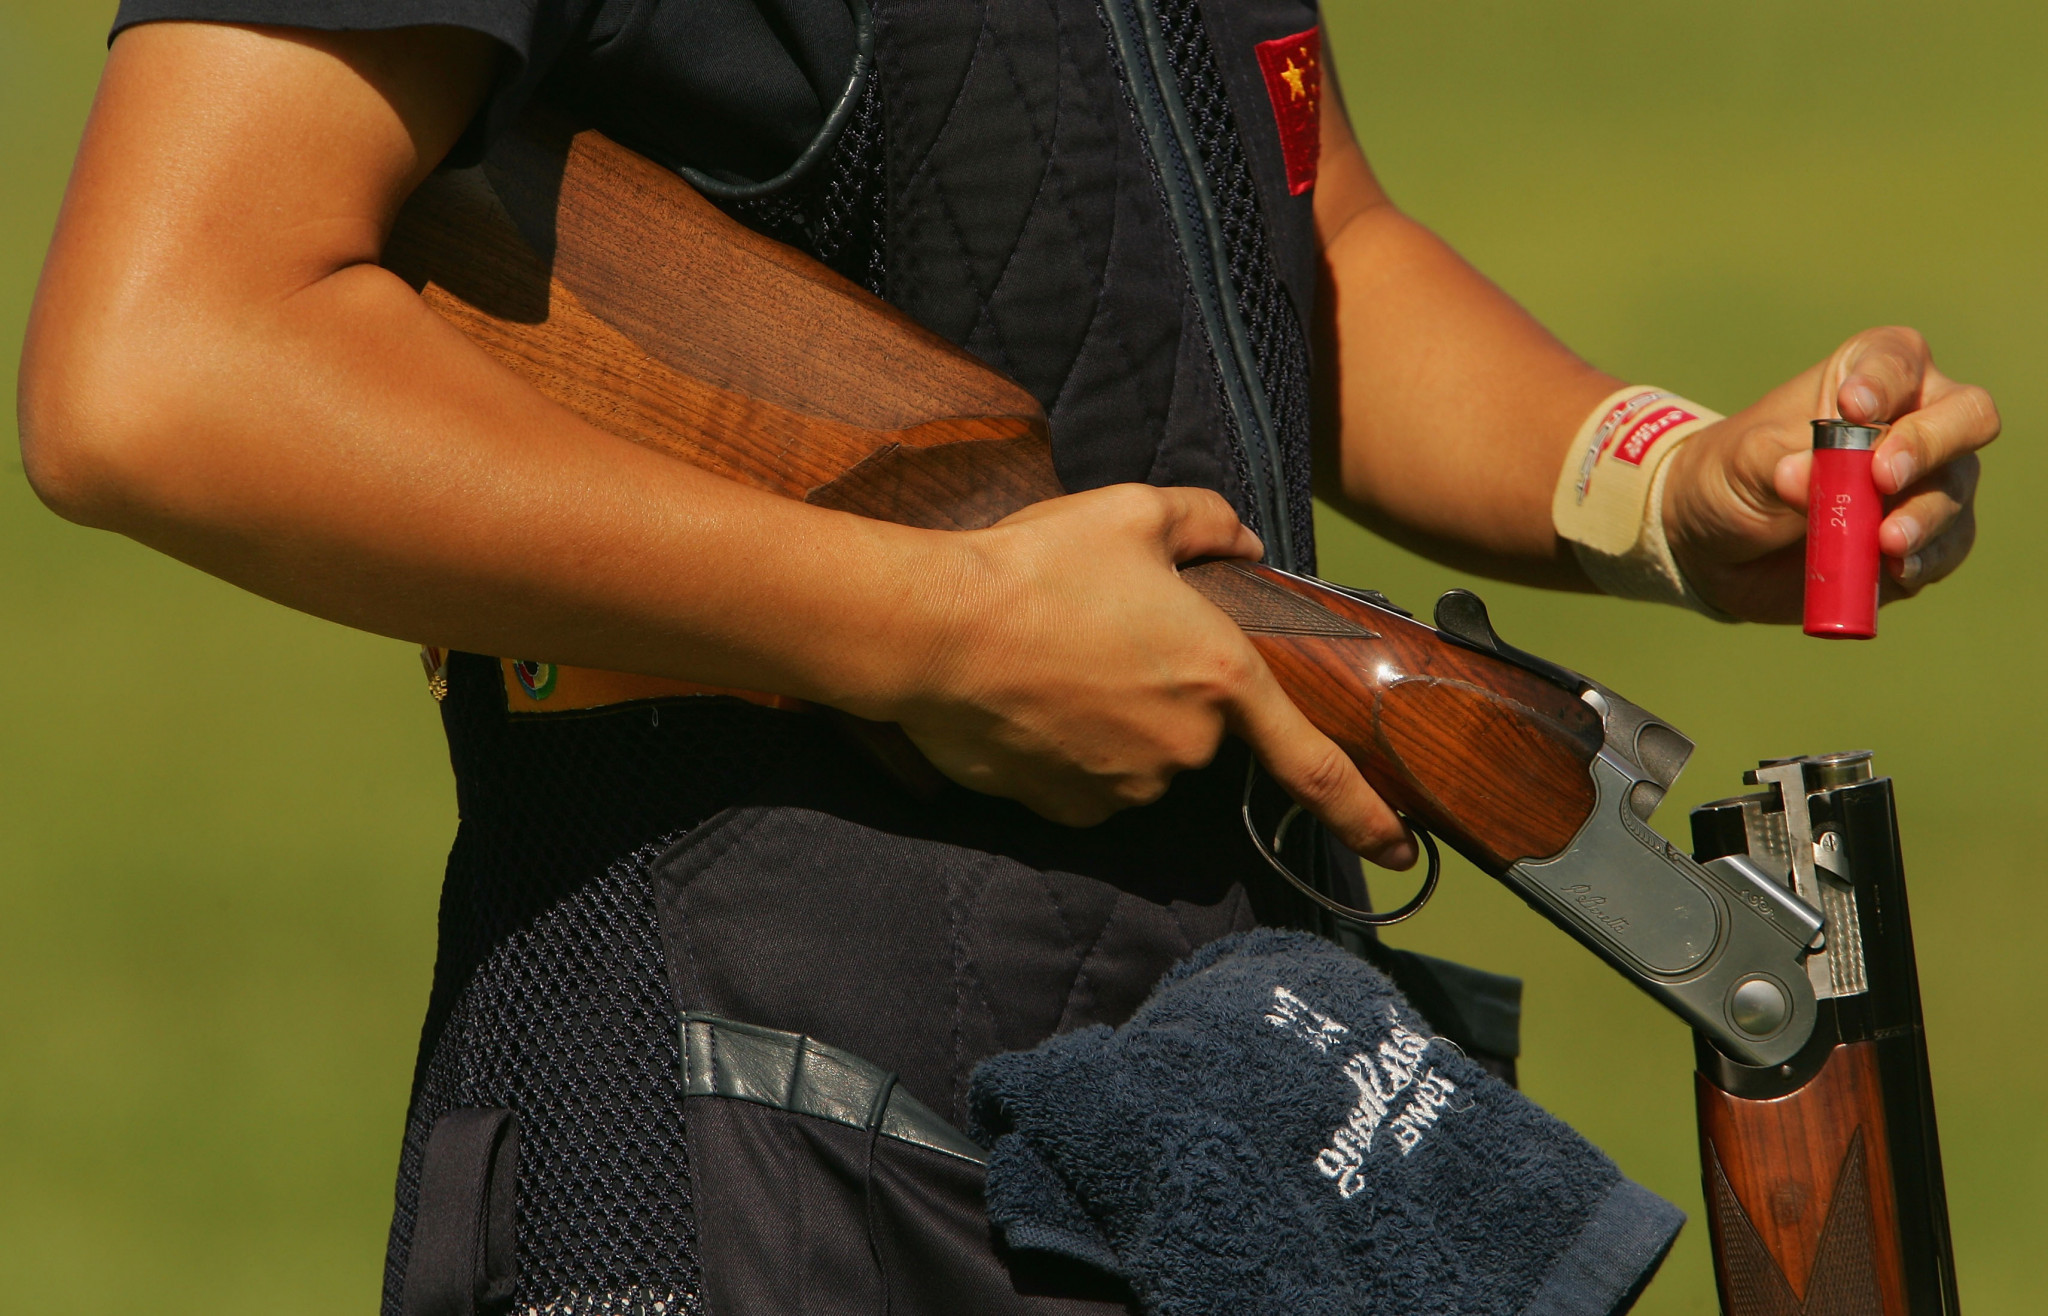 Lima set to stage ISSF Junior World Championship in rifle, pistol and shotgun